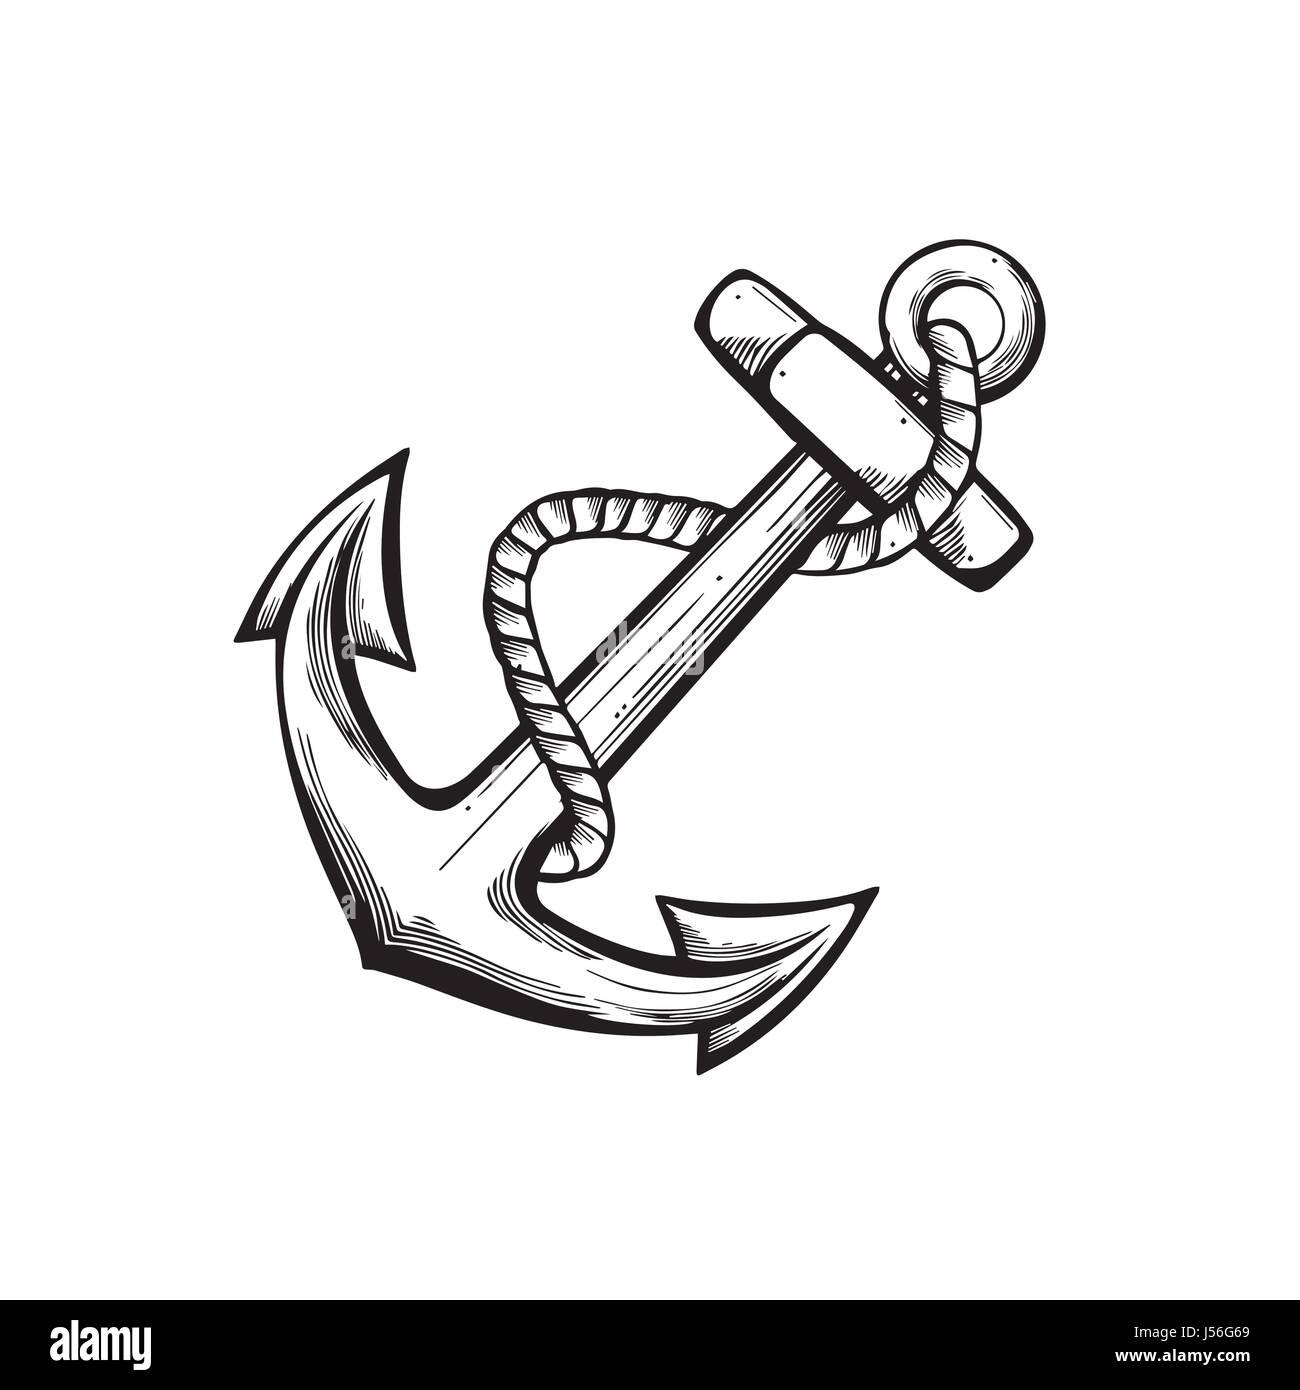 Anchor Tattoo Design Stock Vector Art Illustration Vector Image